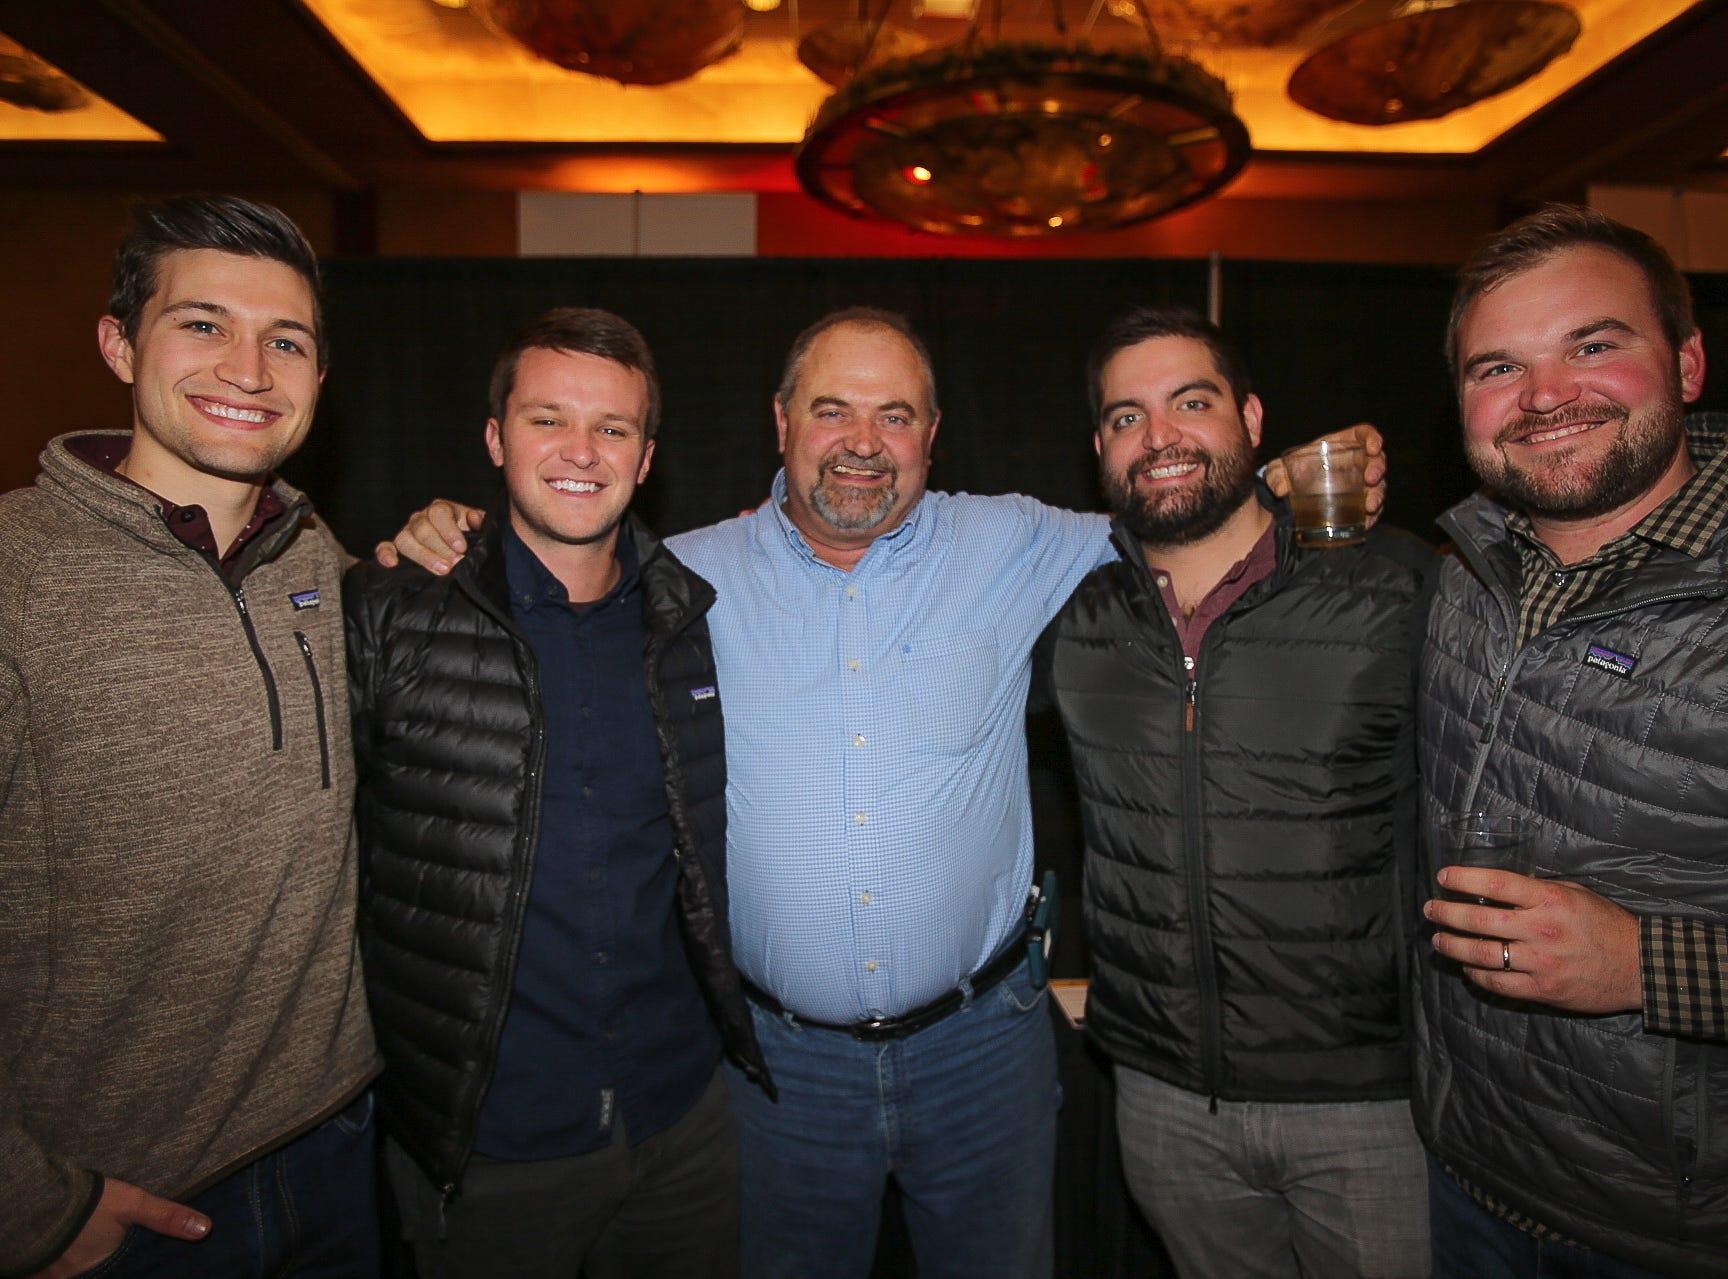 Nick McDowell, Bradley Herschend, Brian and Zeke King, and Dusty Shackelford